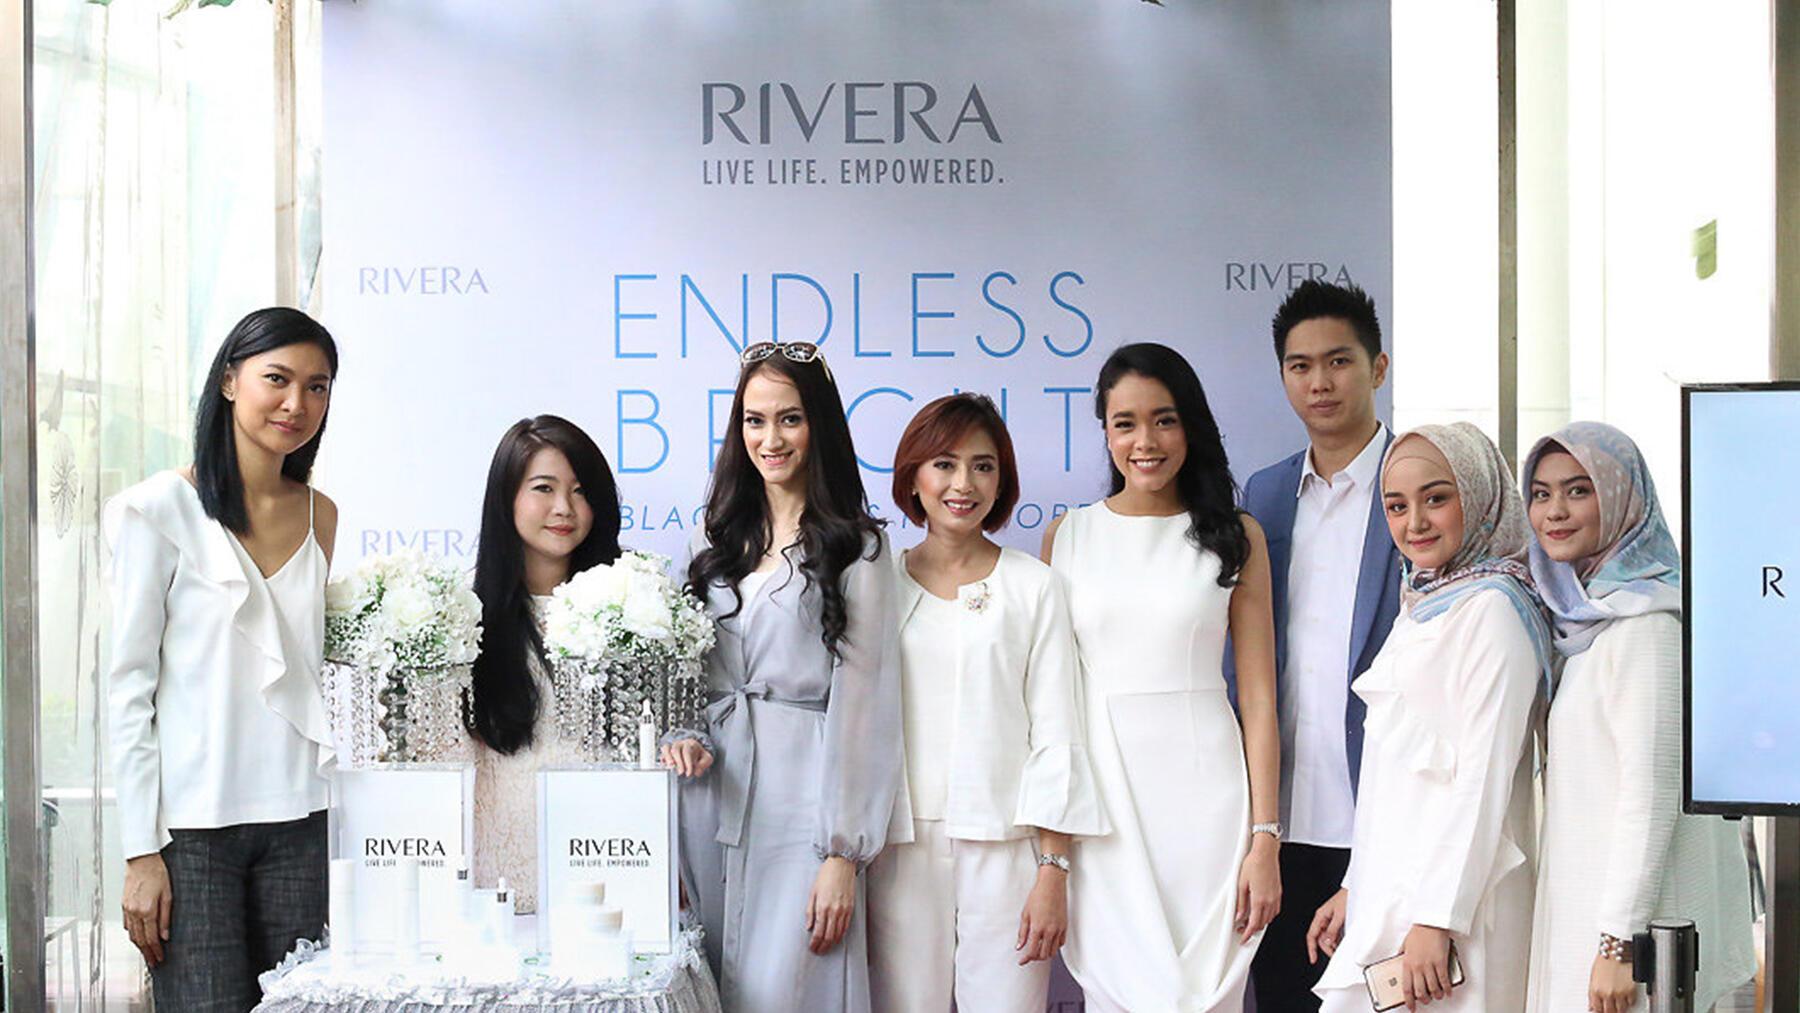 Brand Kecantikan Rivera Luncurkan Rangkaian Produk Brightening Baru